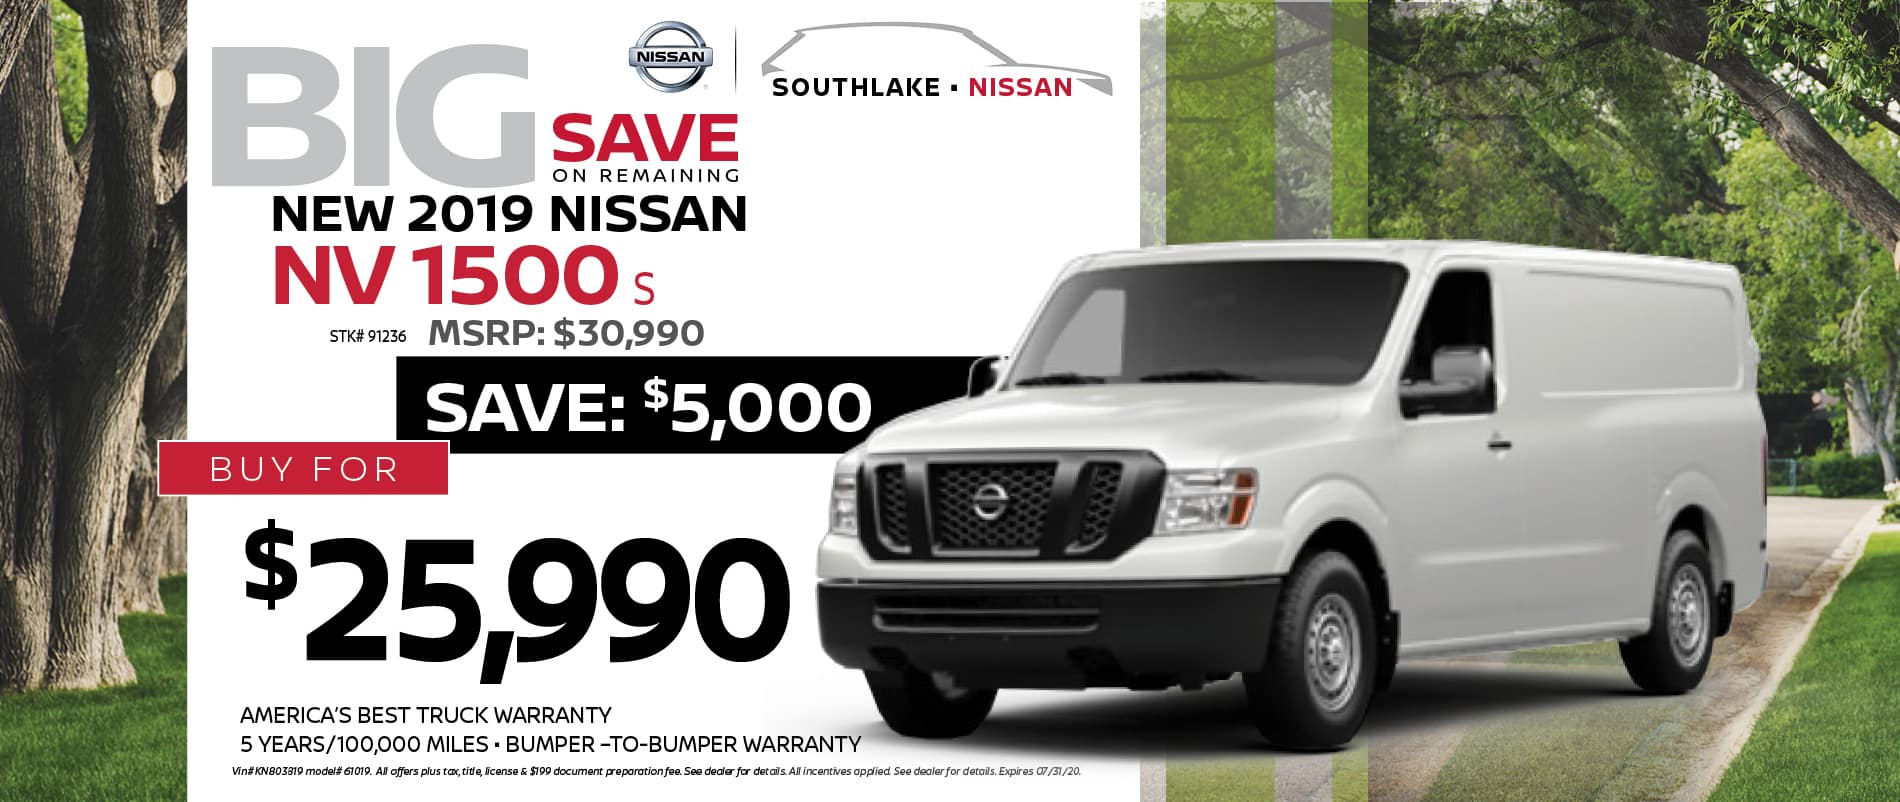 2019 Nissan NV CPO Offer